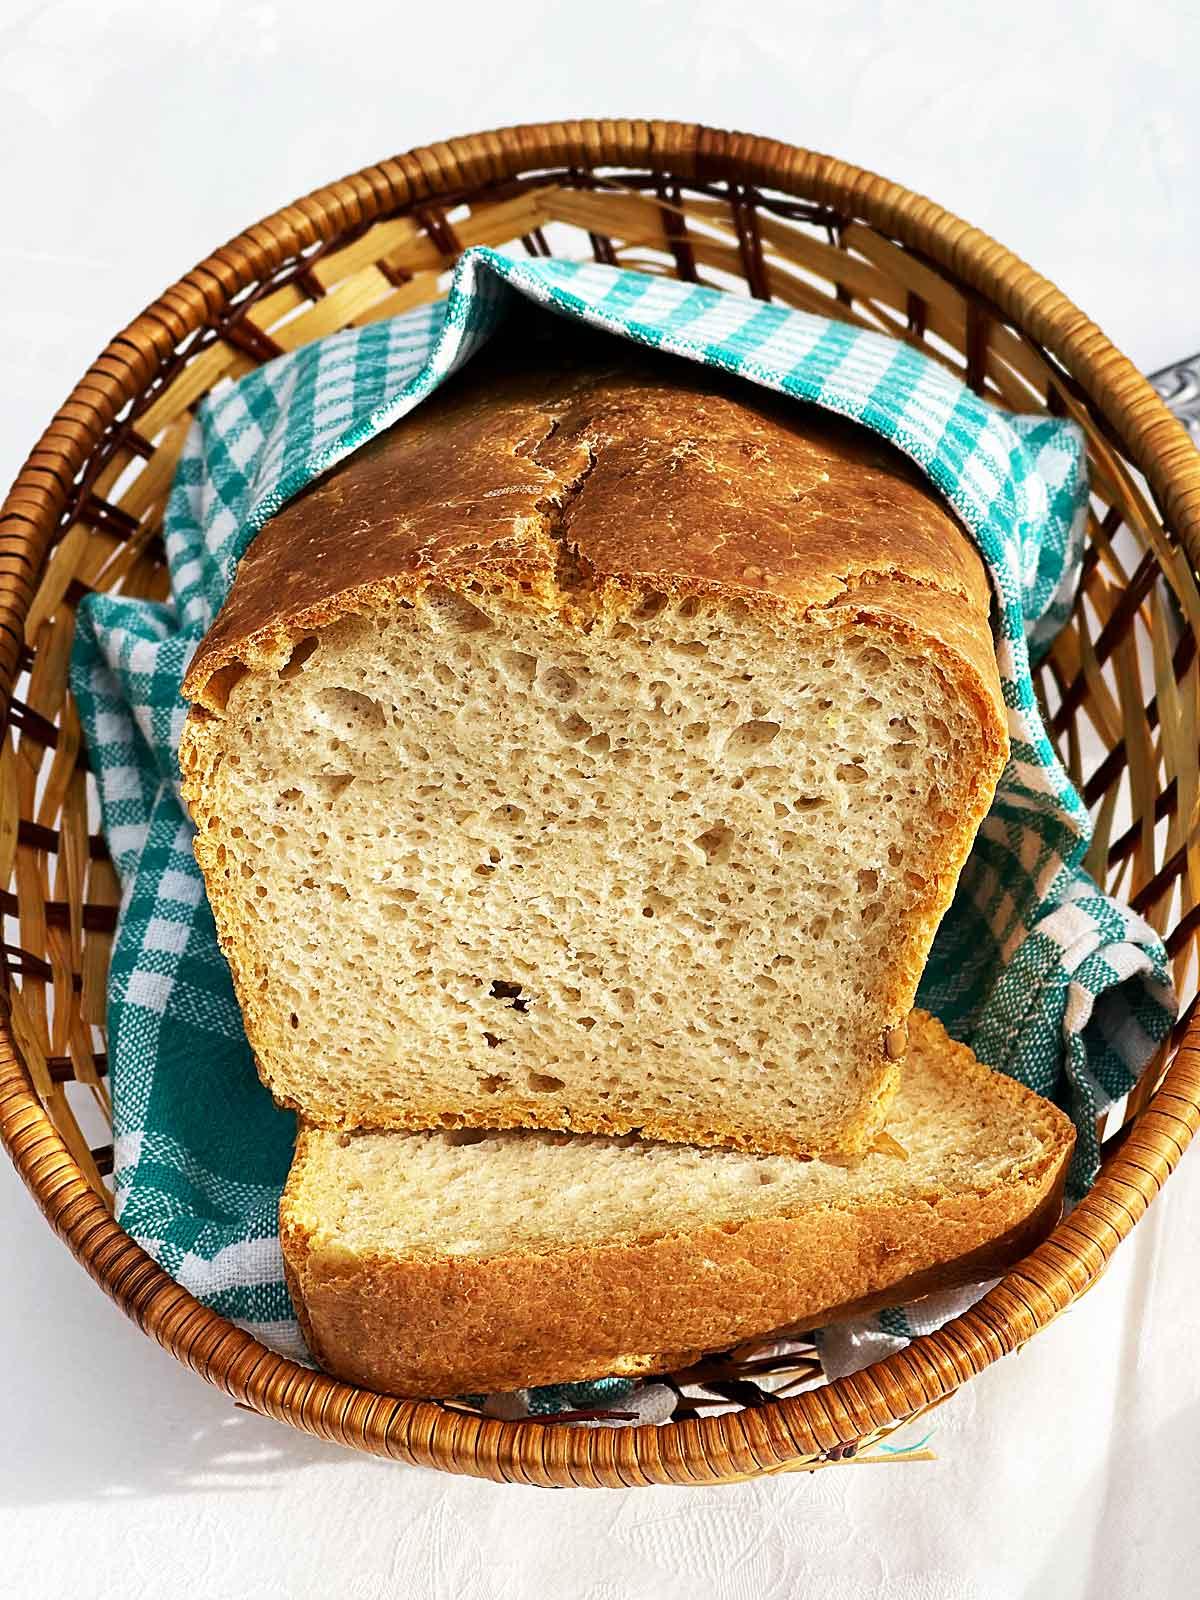 Chrupiący chleb z mąką duru